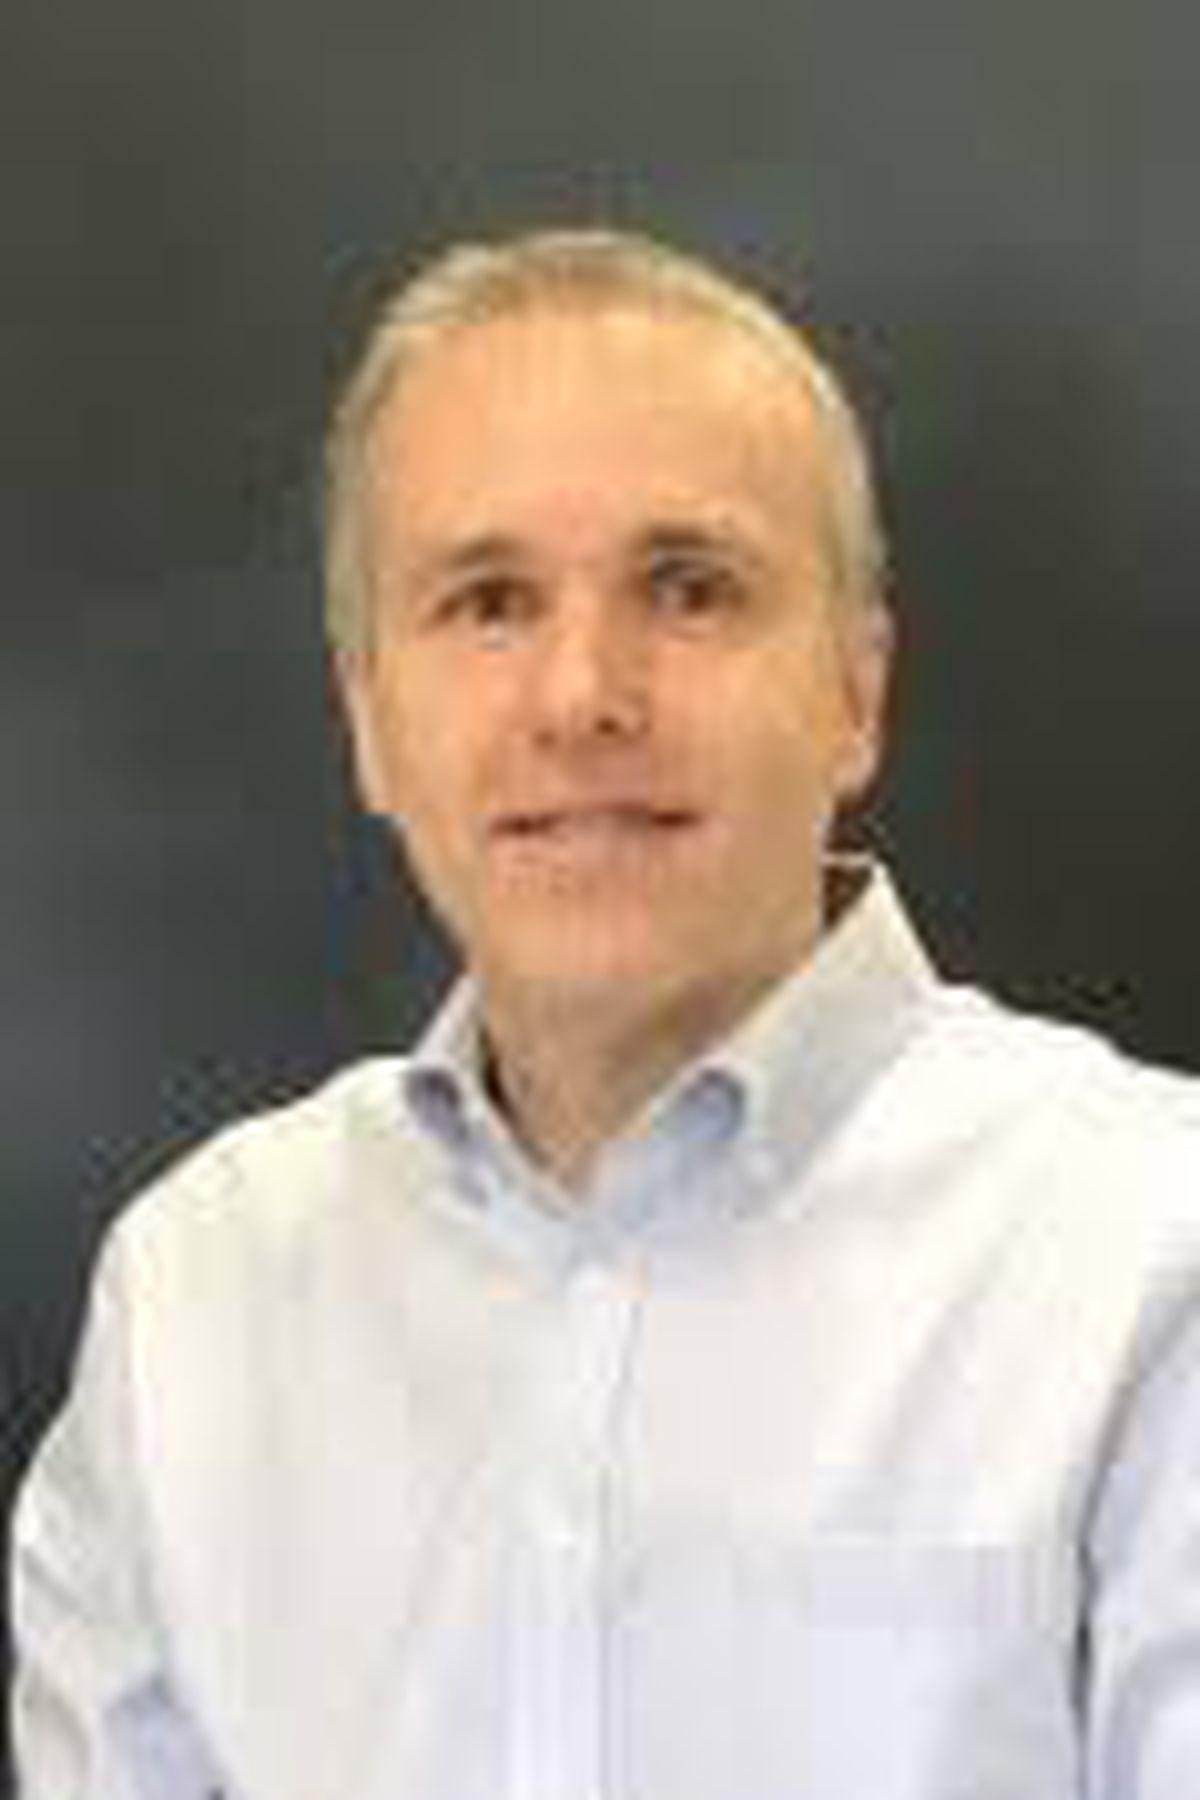 Stuart Bourne - Director of Public Health at Powys Teaching Health Board - PTHB